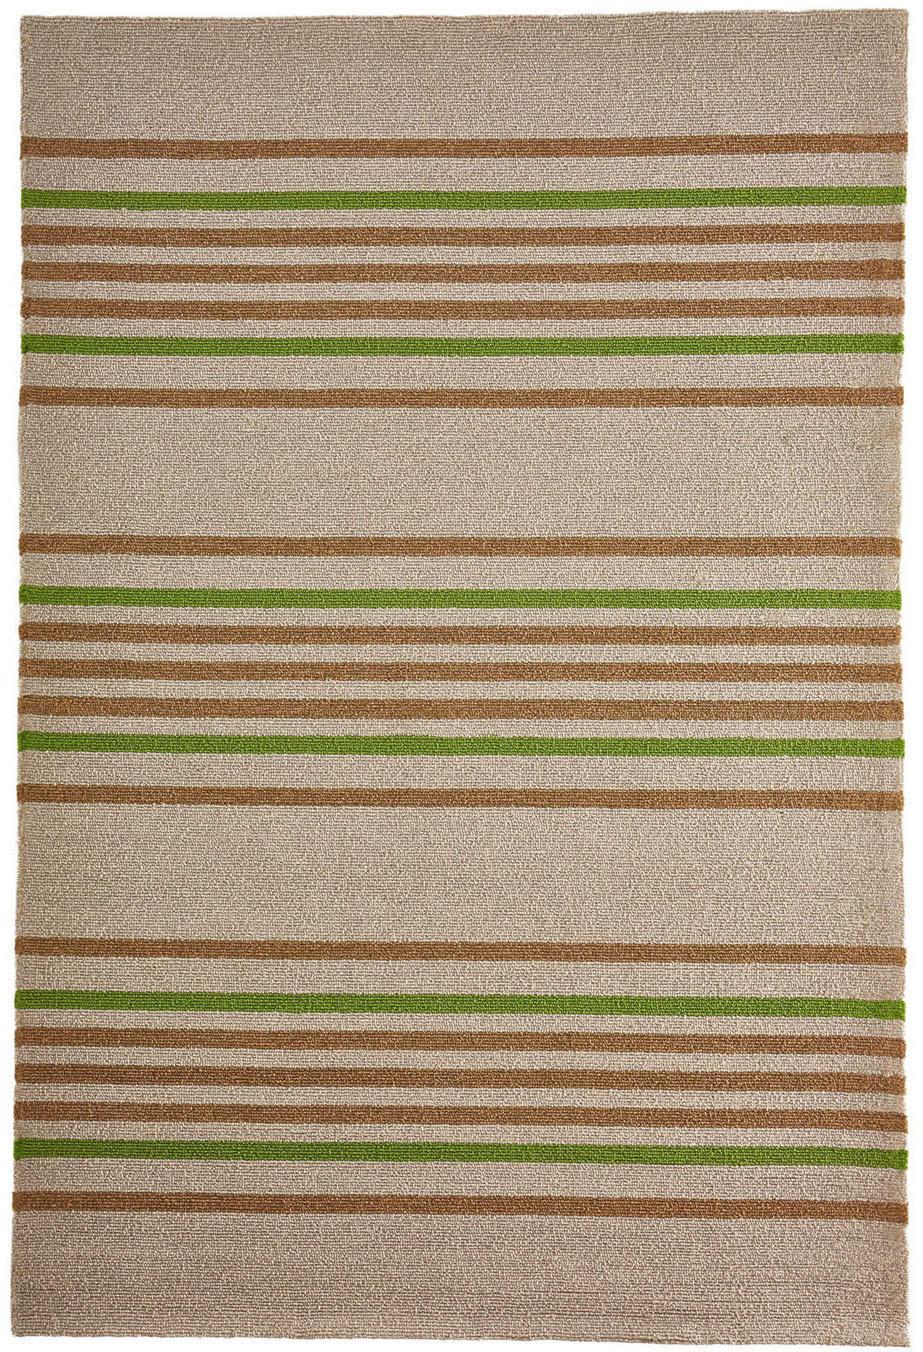 Trans-Ocean Napoli Stripe 742106 Green